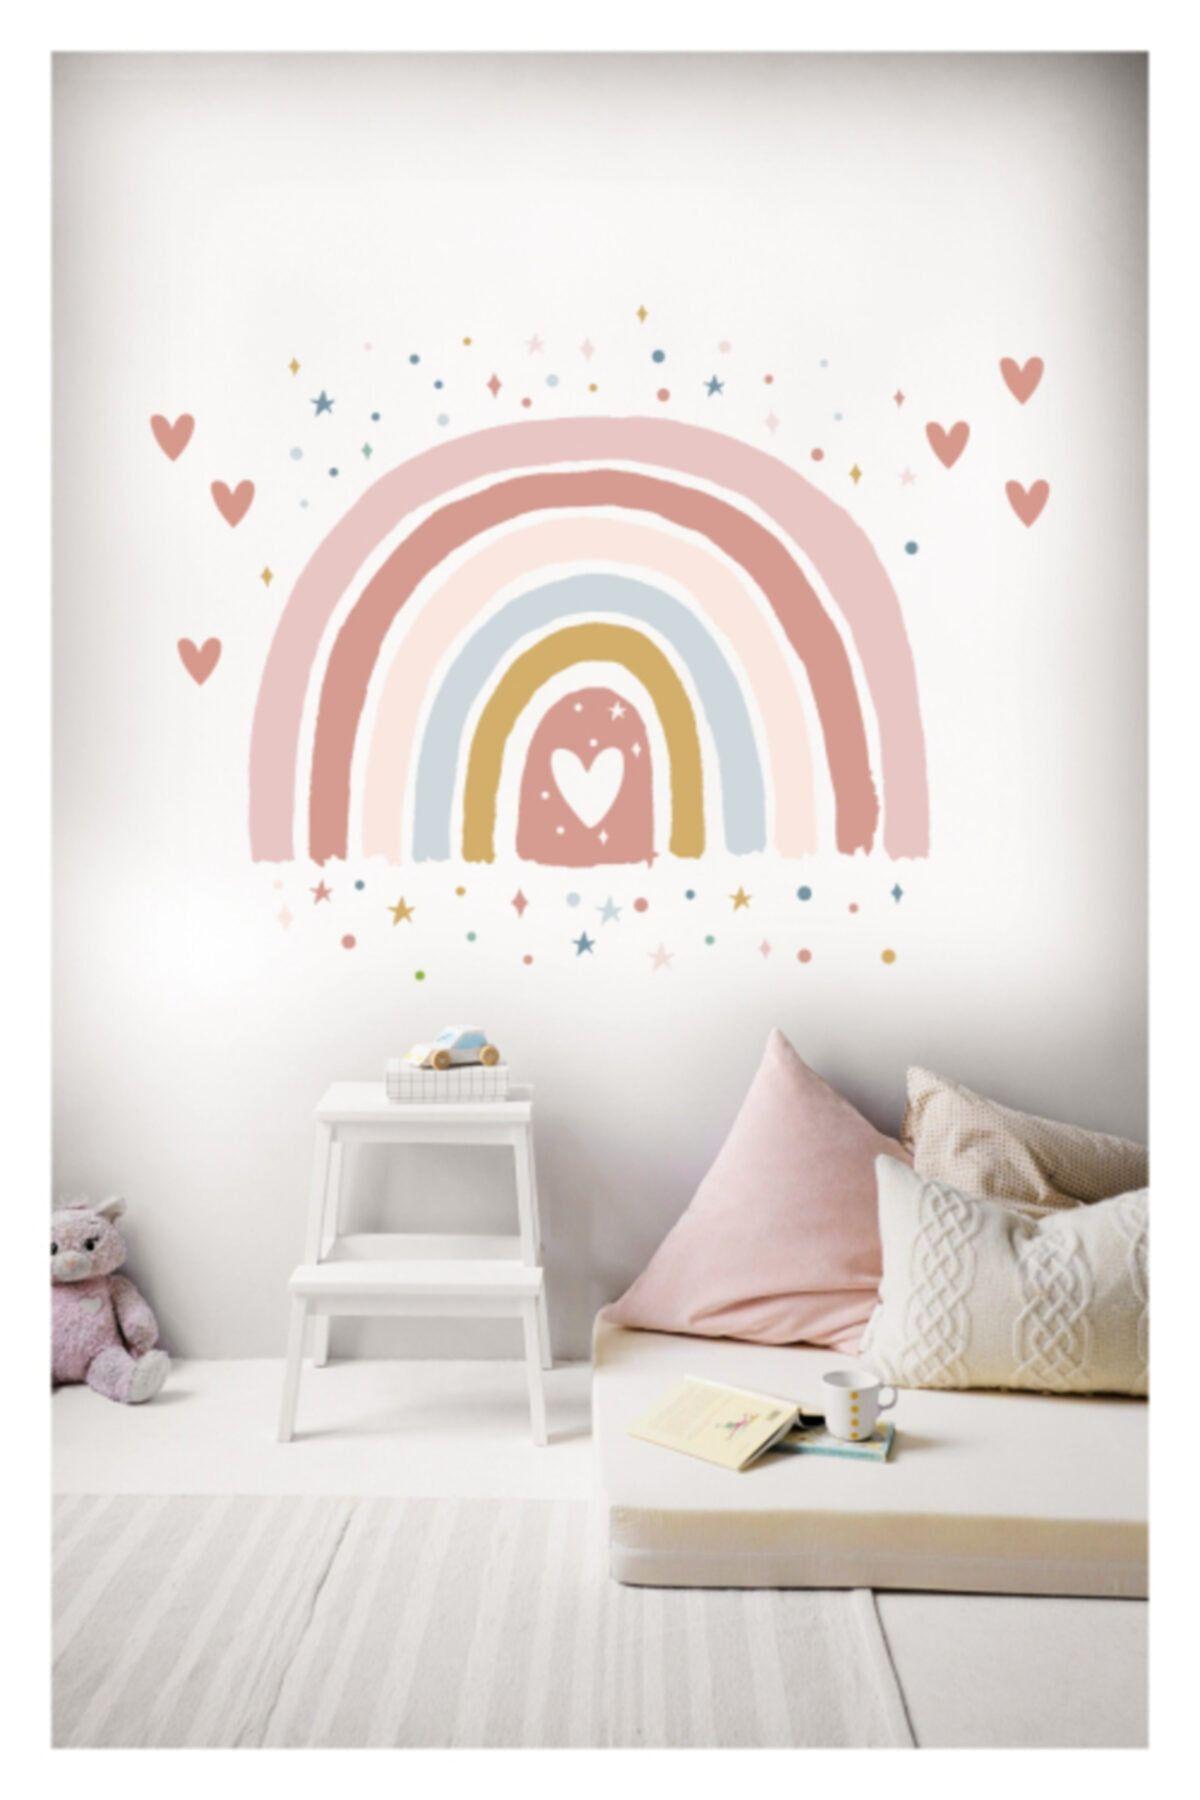 Boho Pink Rainbow and Hearts Wall Sticker Girls Room Wall Decor Nursery Wall Decal